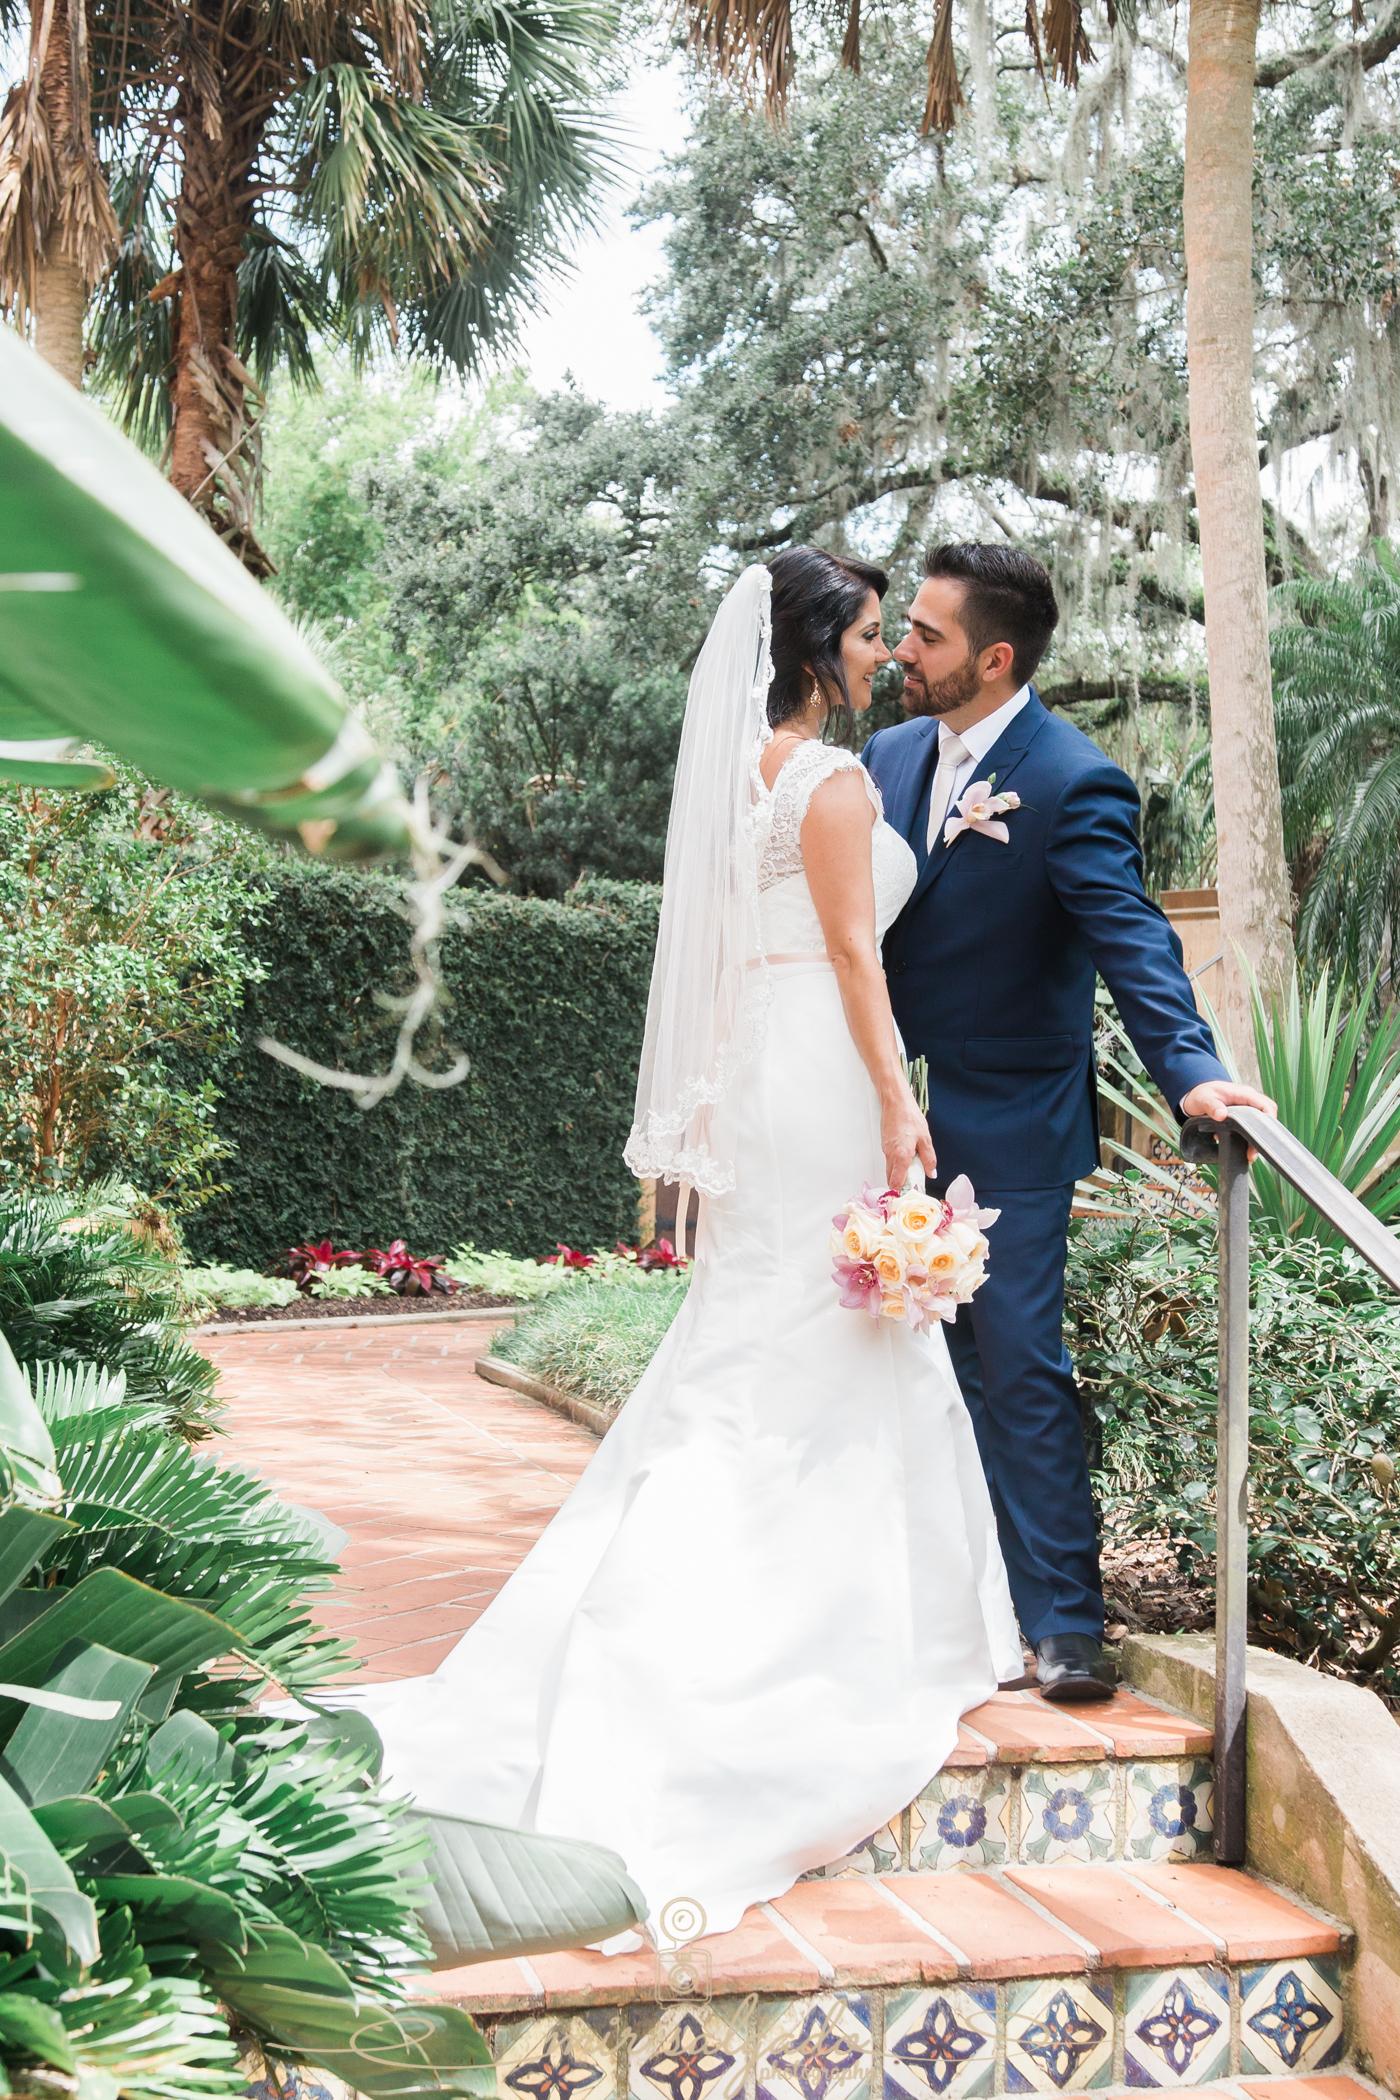 Bok-tower-gardens-wedding-day, garden-wedding-in-Florida, Tampa-wedding-photographer